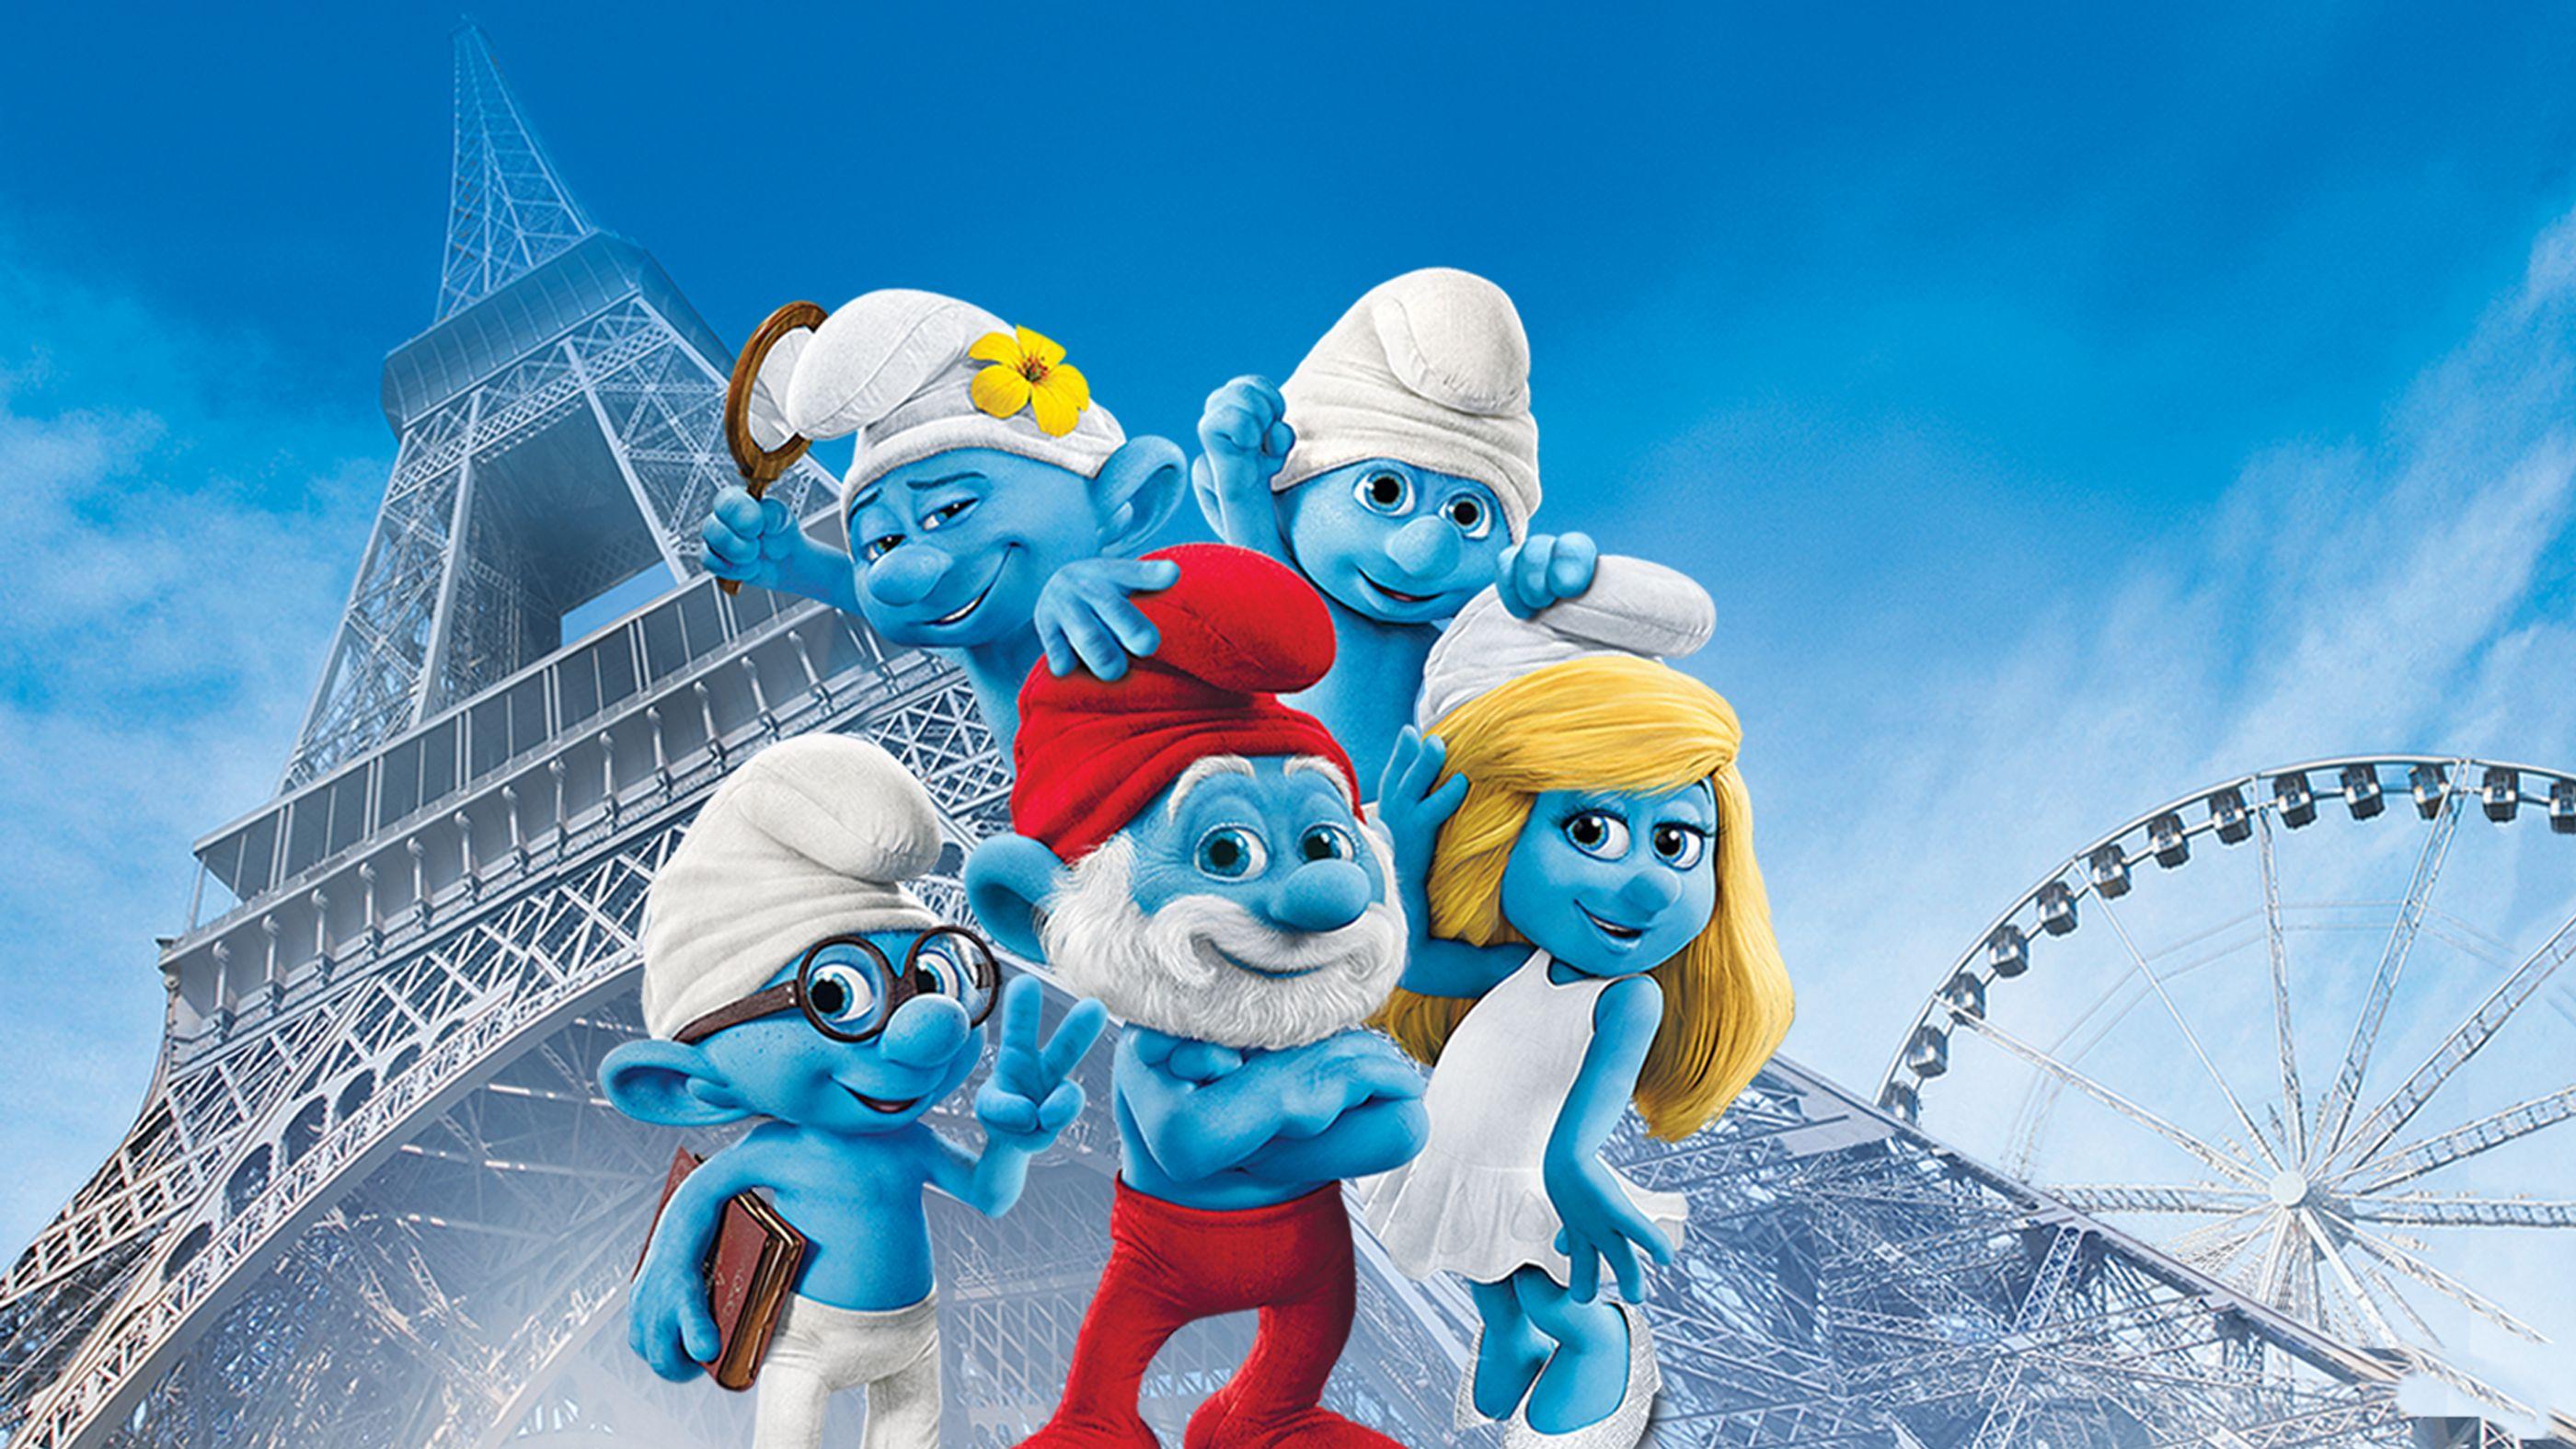 The Smurfs 2 Full Movie Movies Anywhere